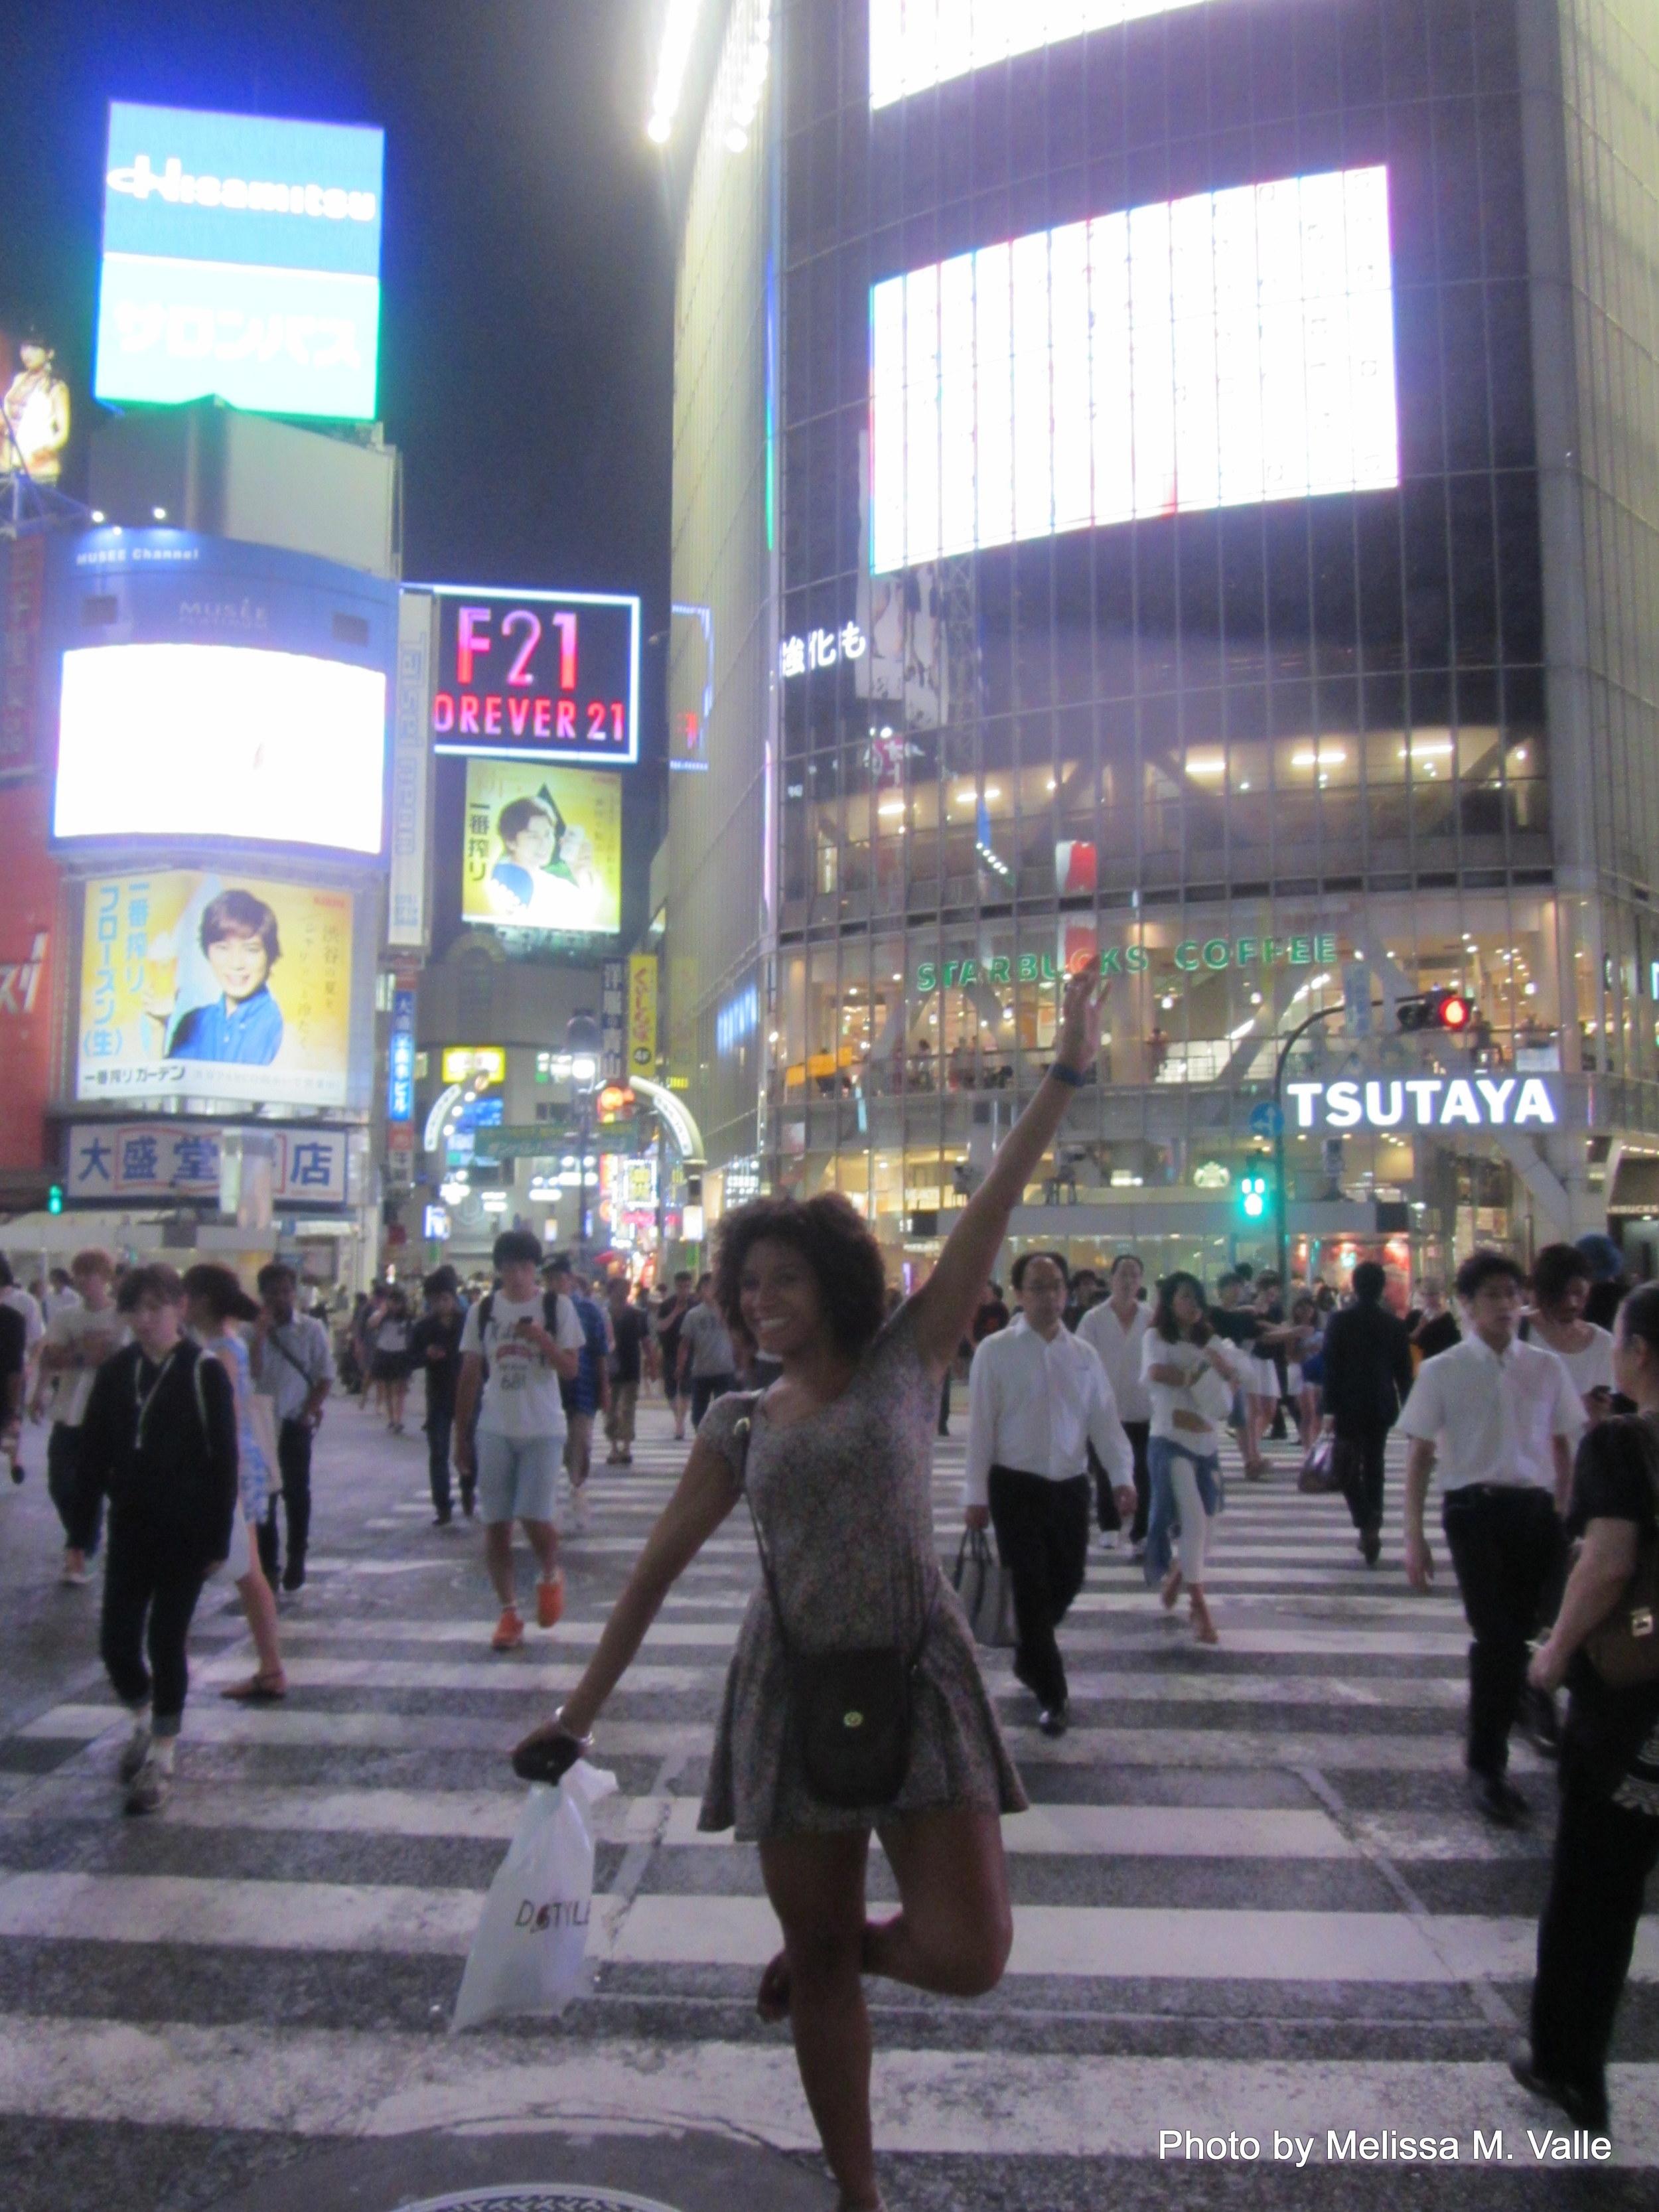 Melissa Valle in Shibuya, Tokyo, Japan